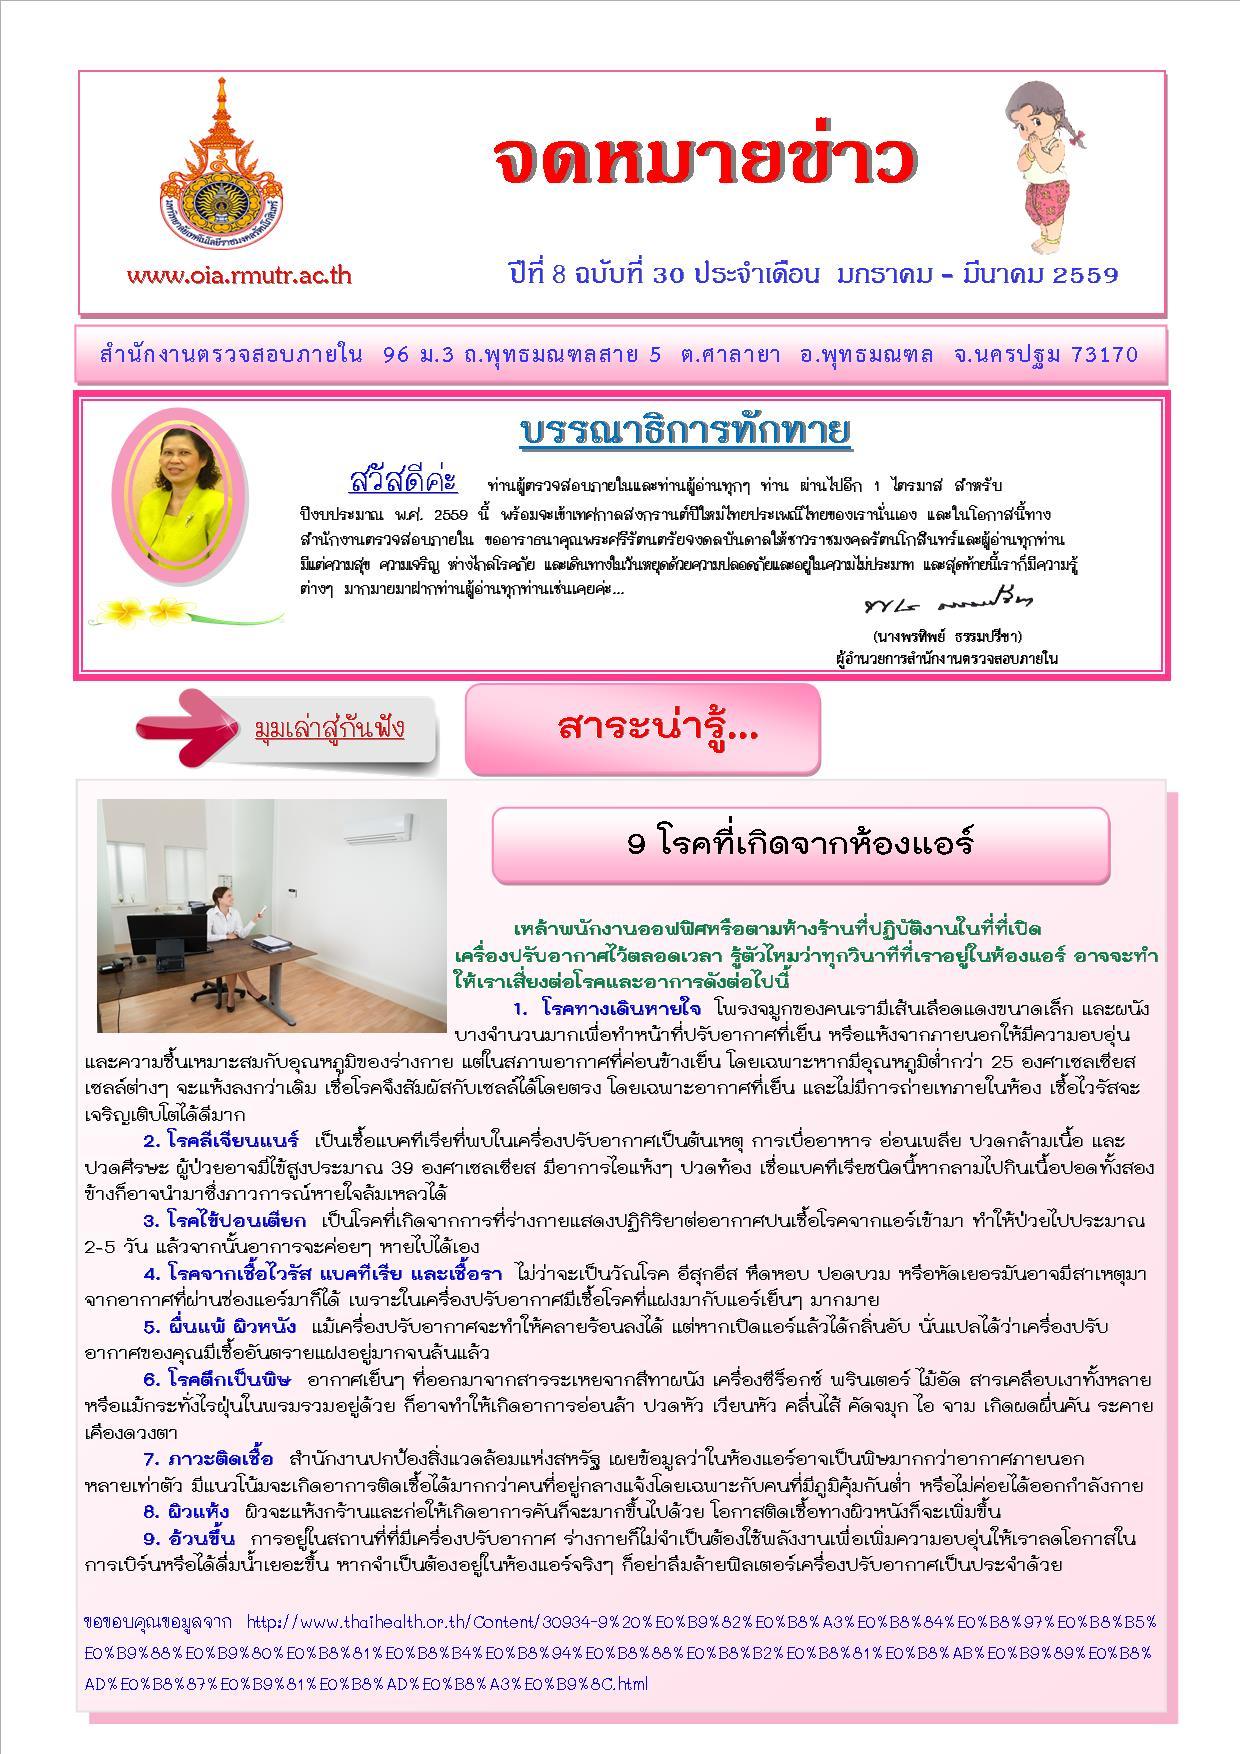 Rmutr_IA_NEW-29-YEAR-8-New-59